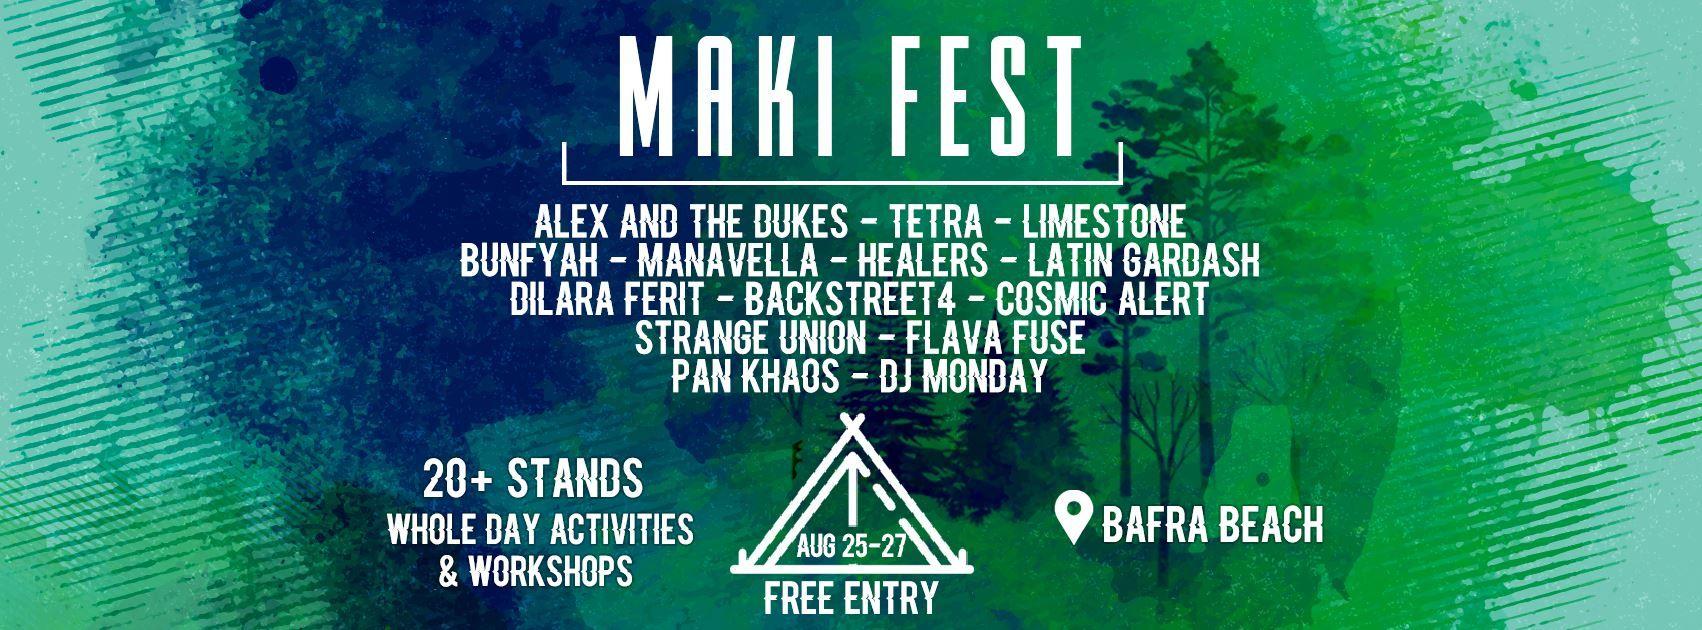 Maki Cyprus Festival 2017